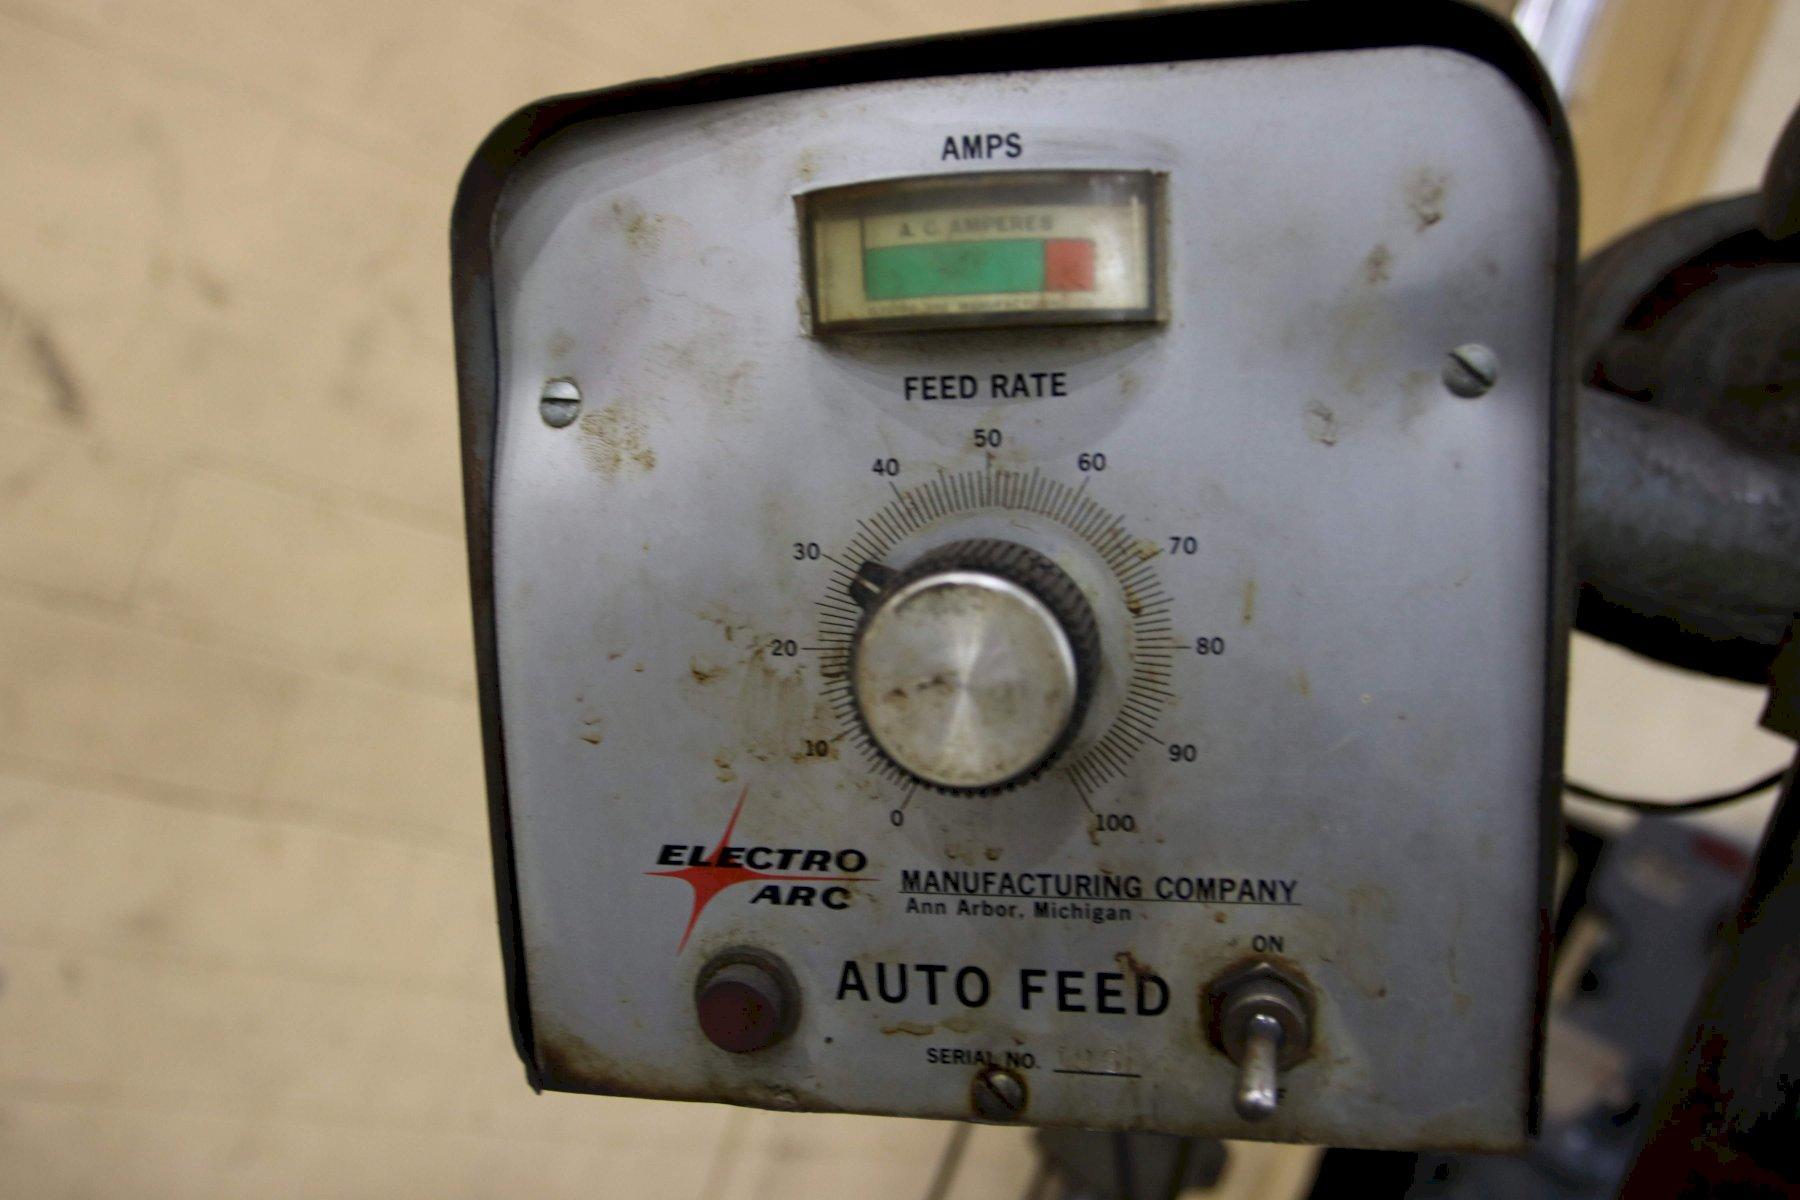 ELECTRO ARC MODEL #2DBT TAP DISINTEGRATOR: STOCK# 71181